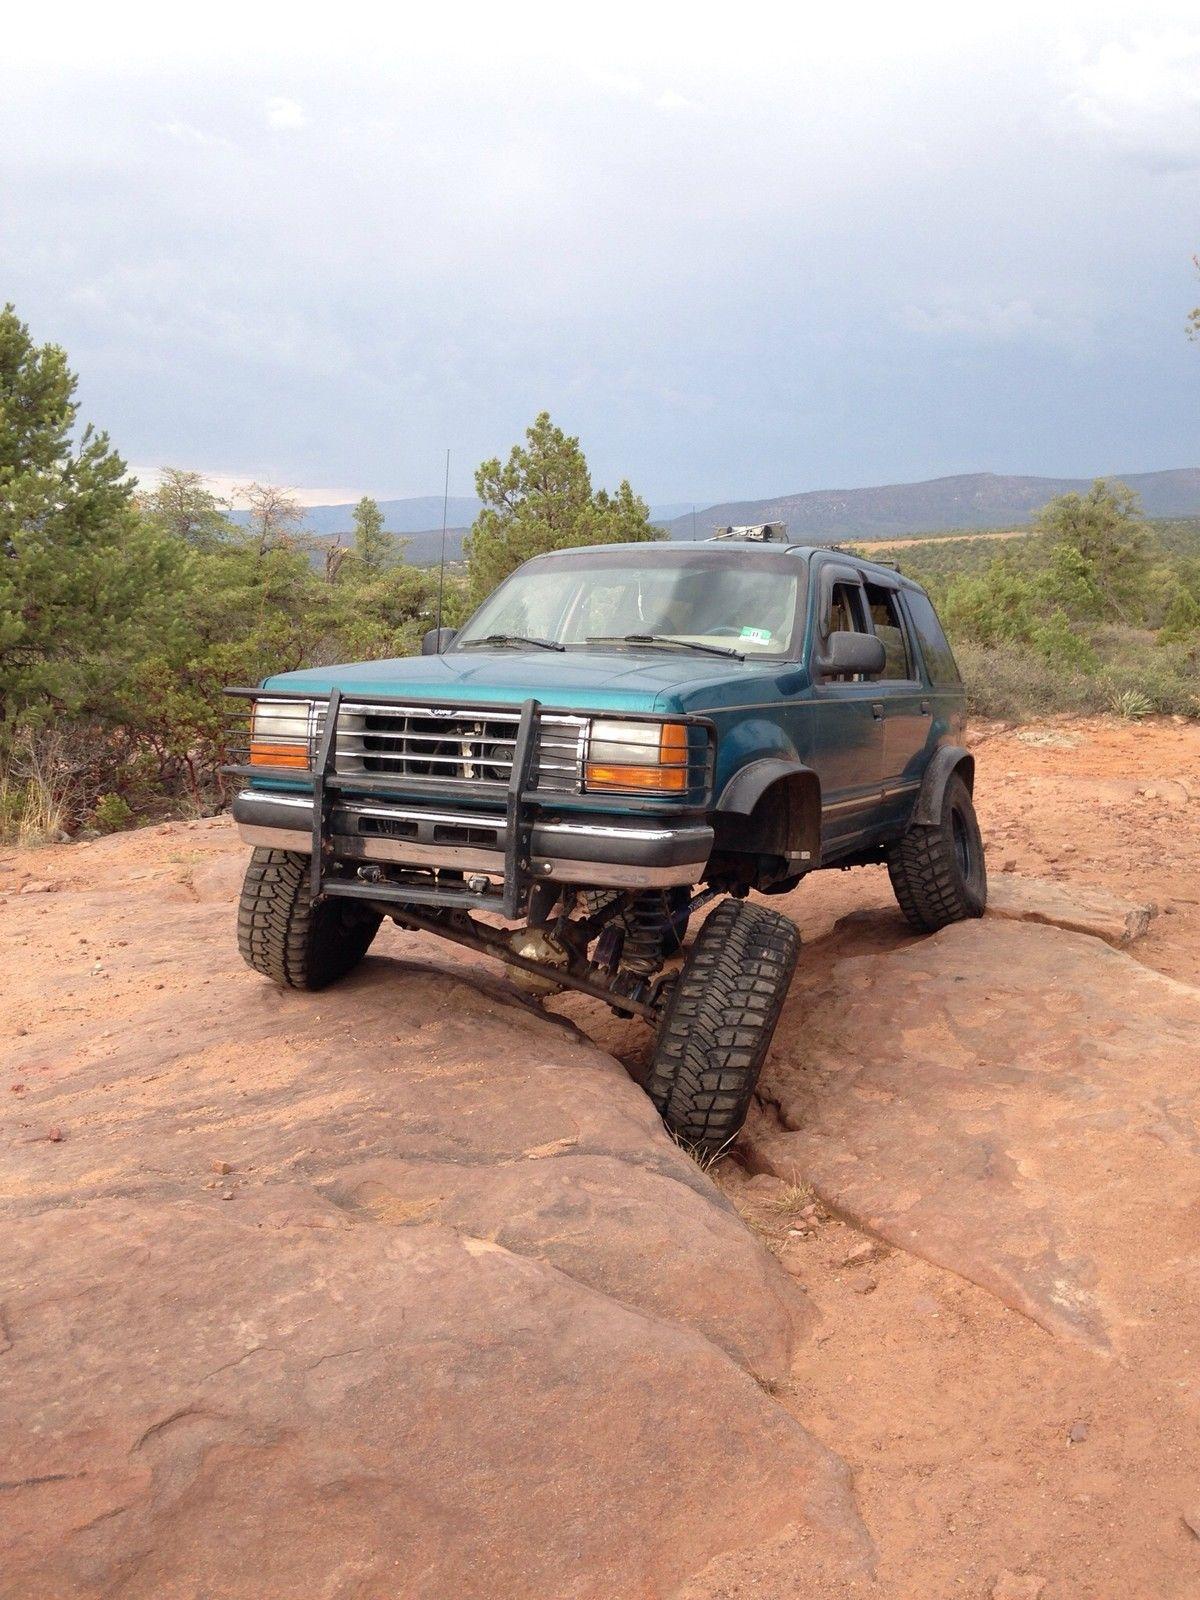 Custom Lifted 94' Ford Explorer Off Road Truck - Classic ...